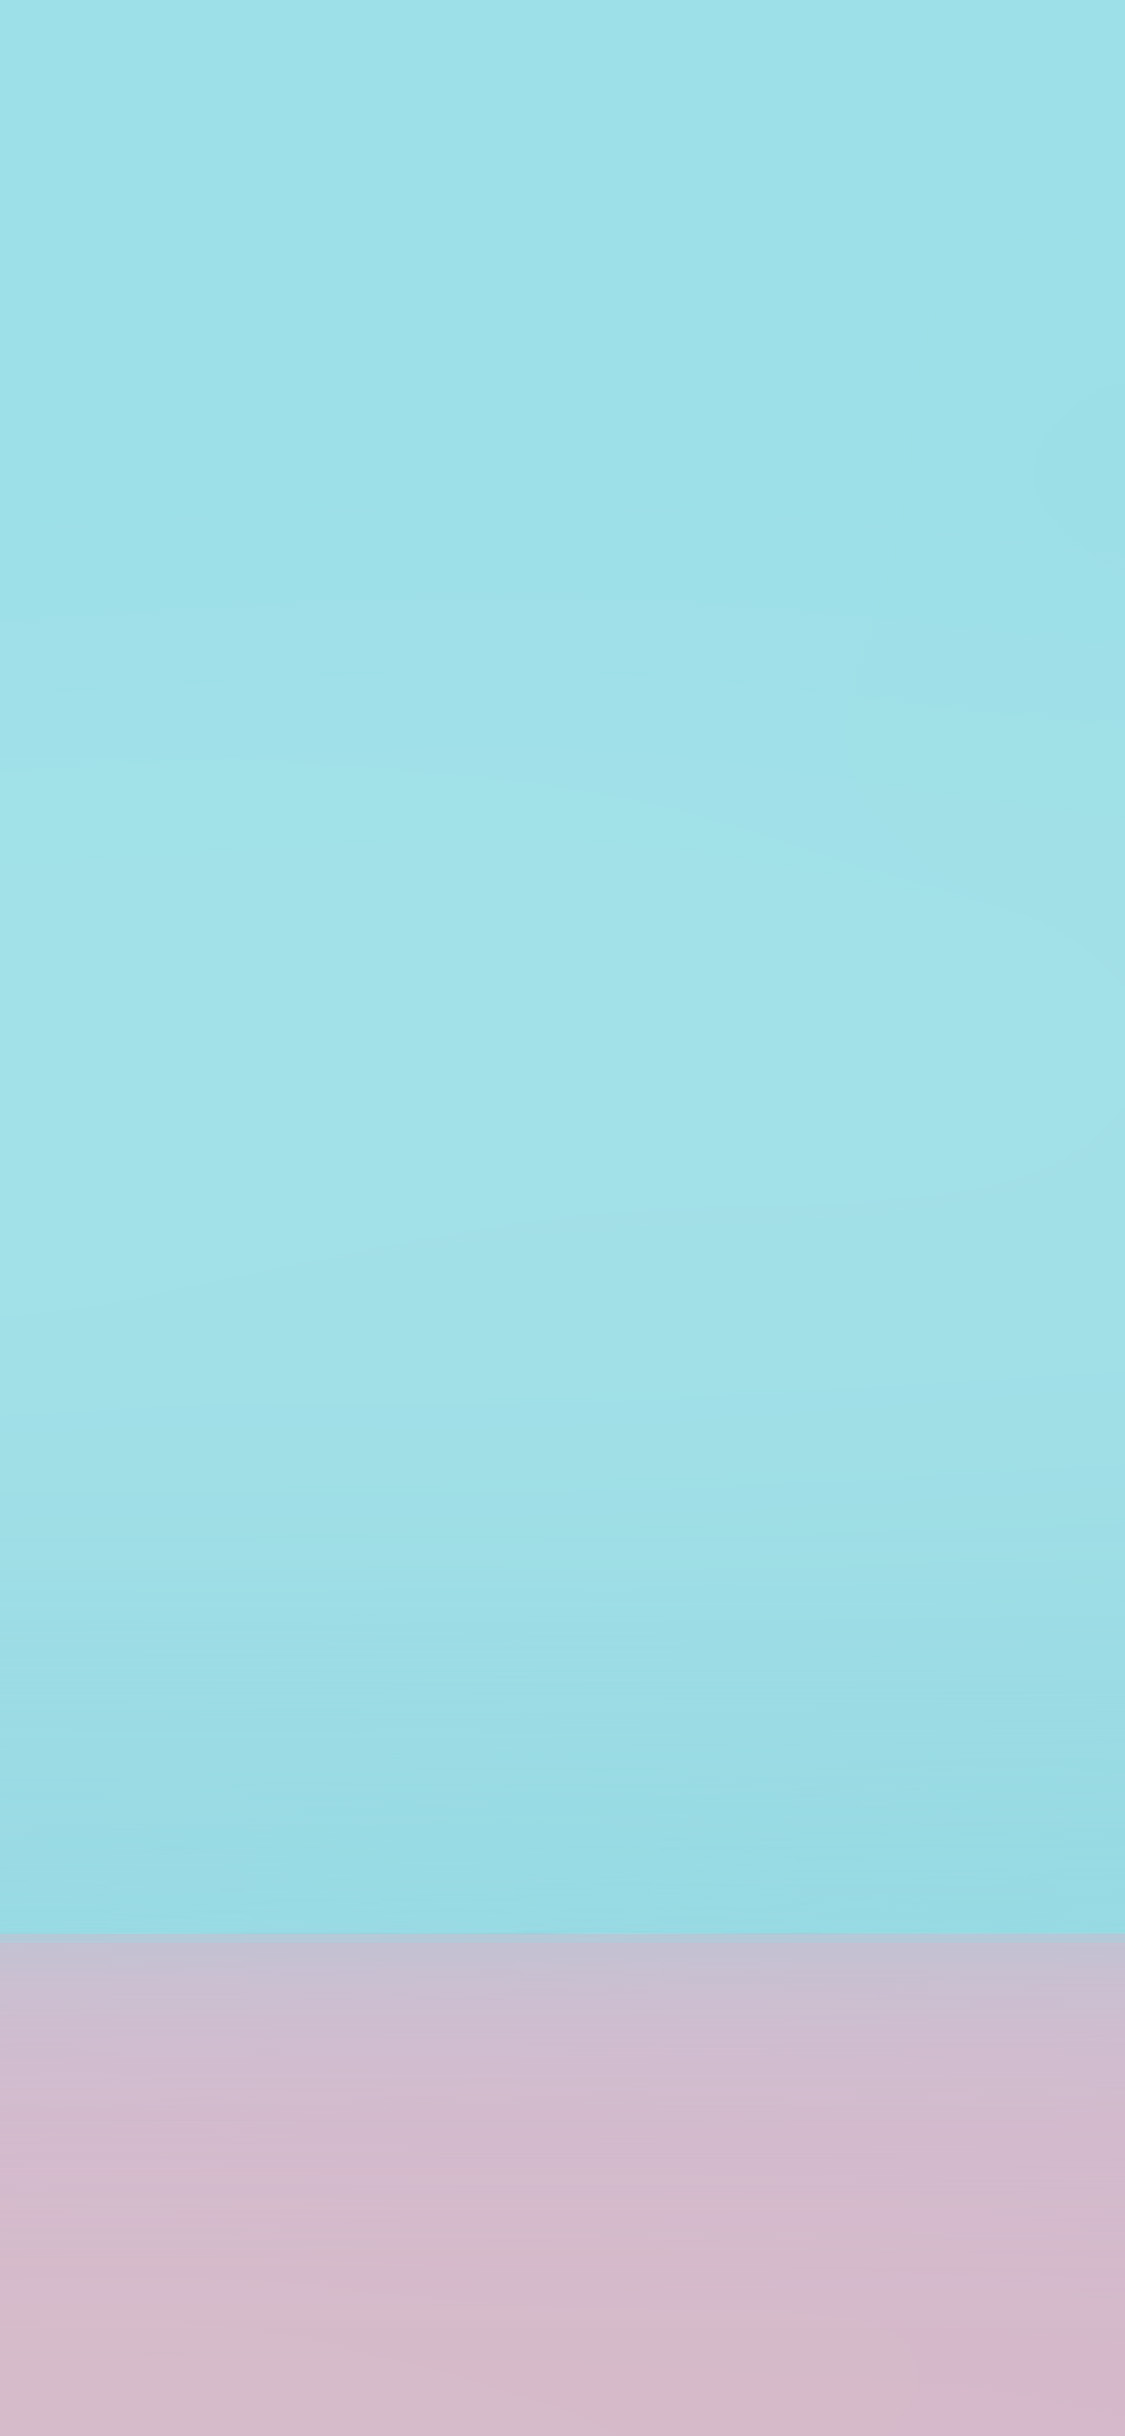 iPhonexpapers.com-Apple-iPhone-wallpaper-sn33-flat-colorlovers-blue-blur-gradation-pastel